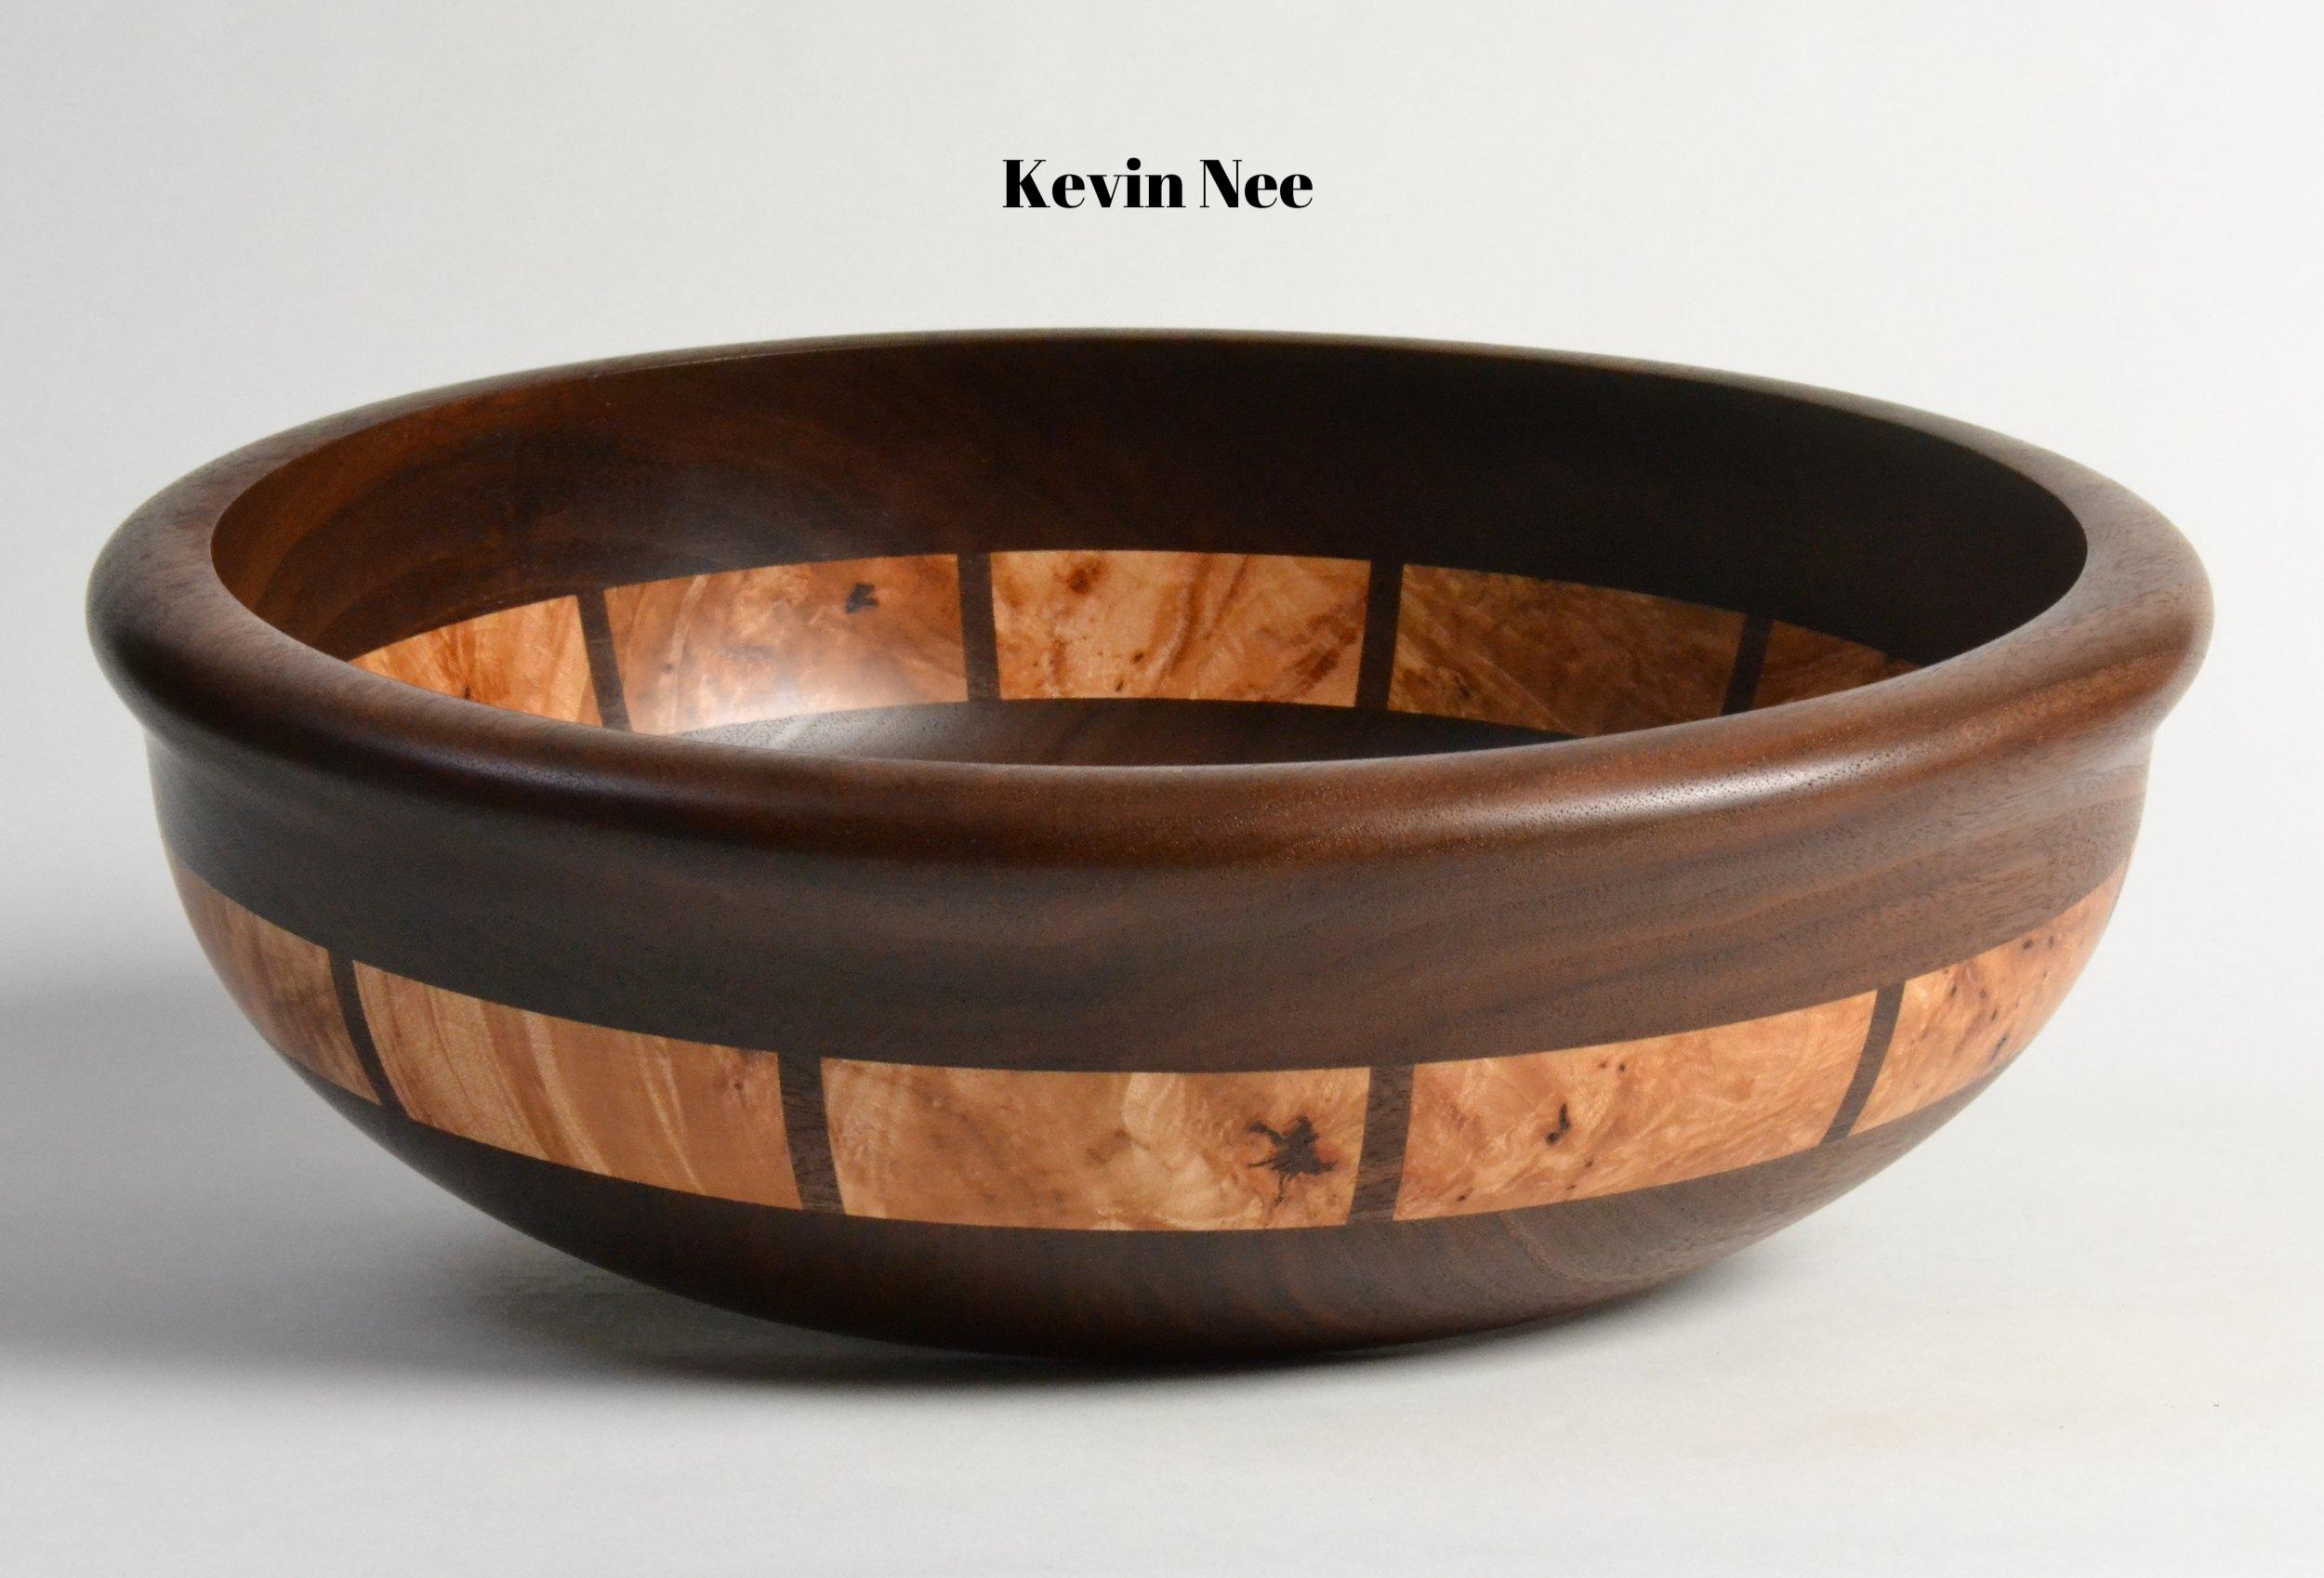 Kevin Nee Bowl_2.JPG